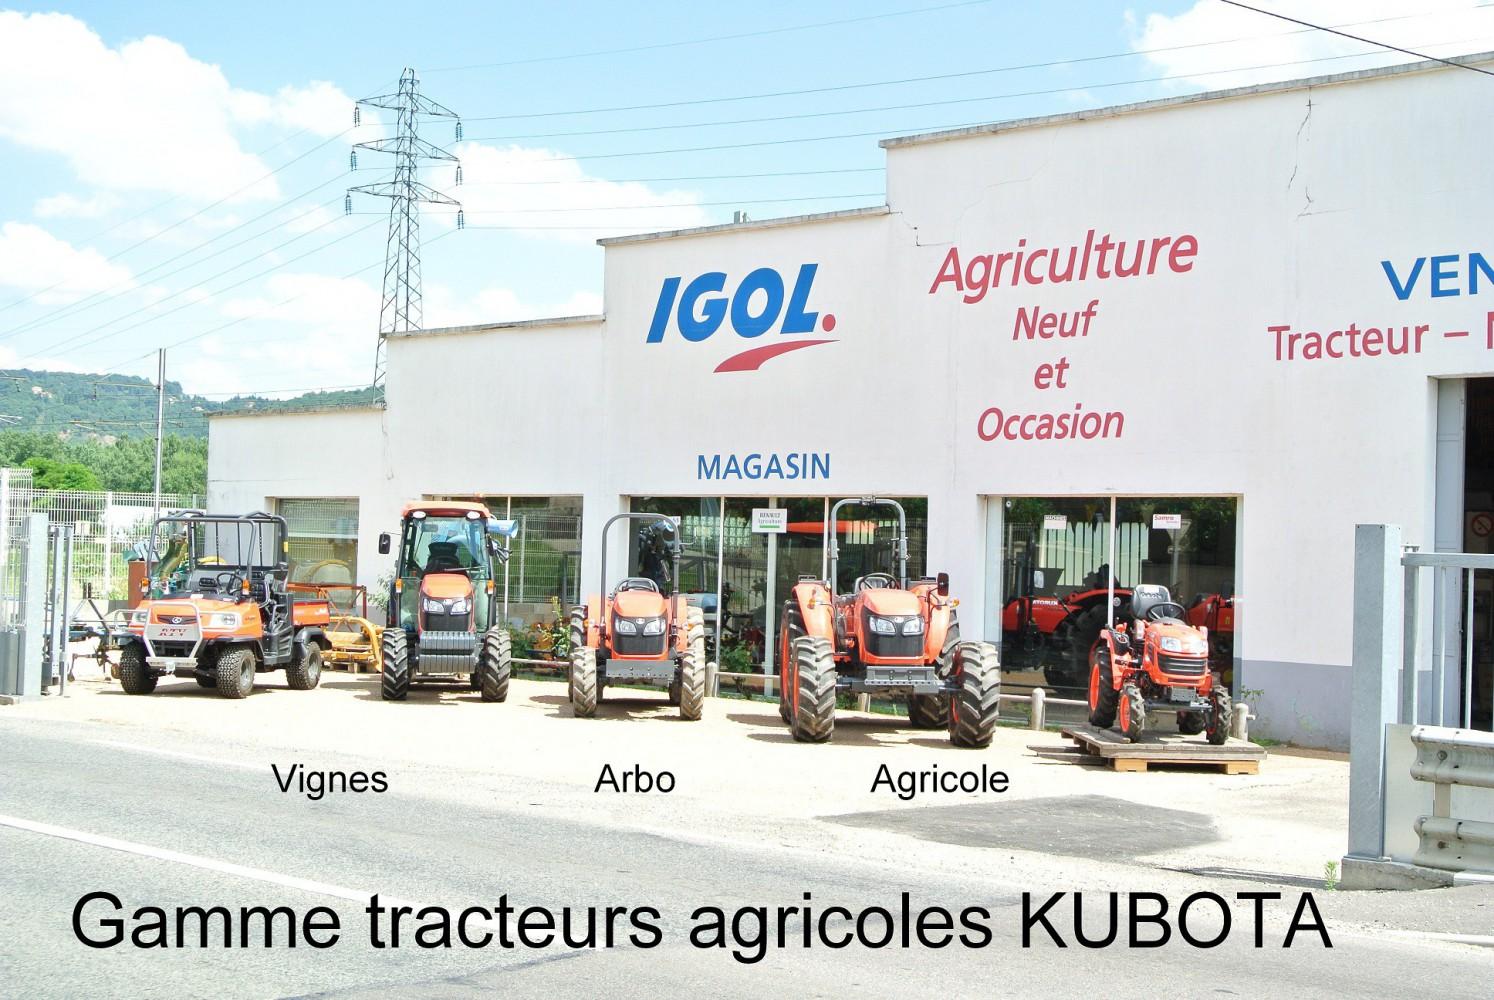 Gamme tracteurs agricoles KUBOTA